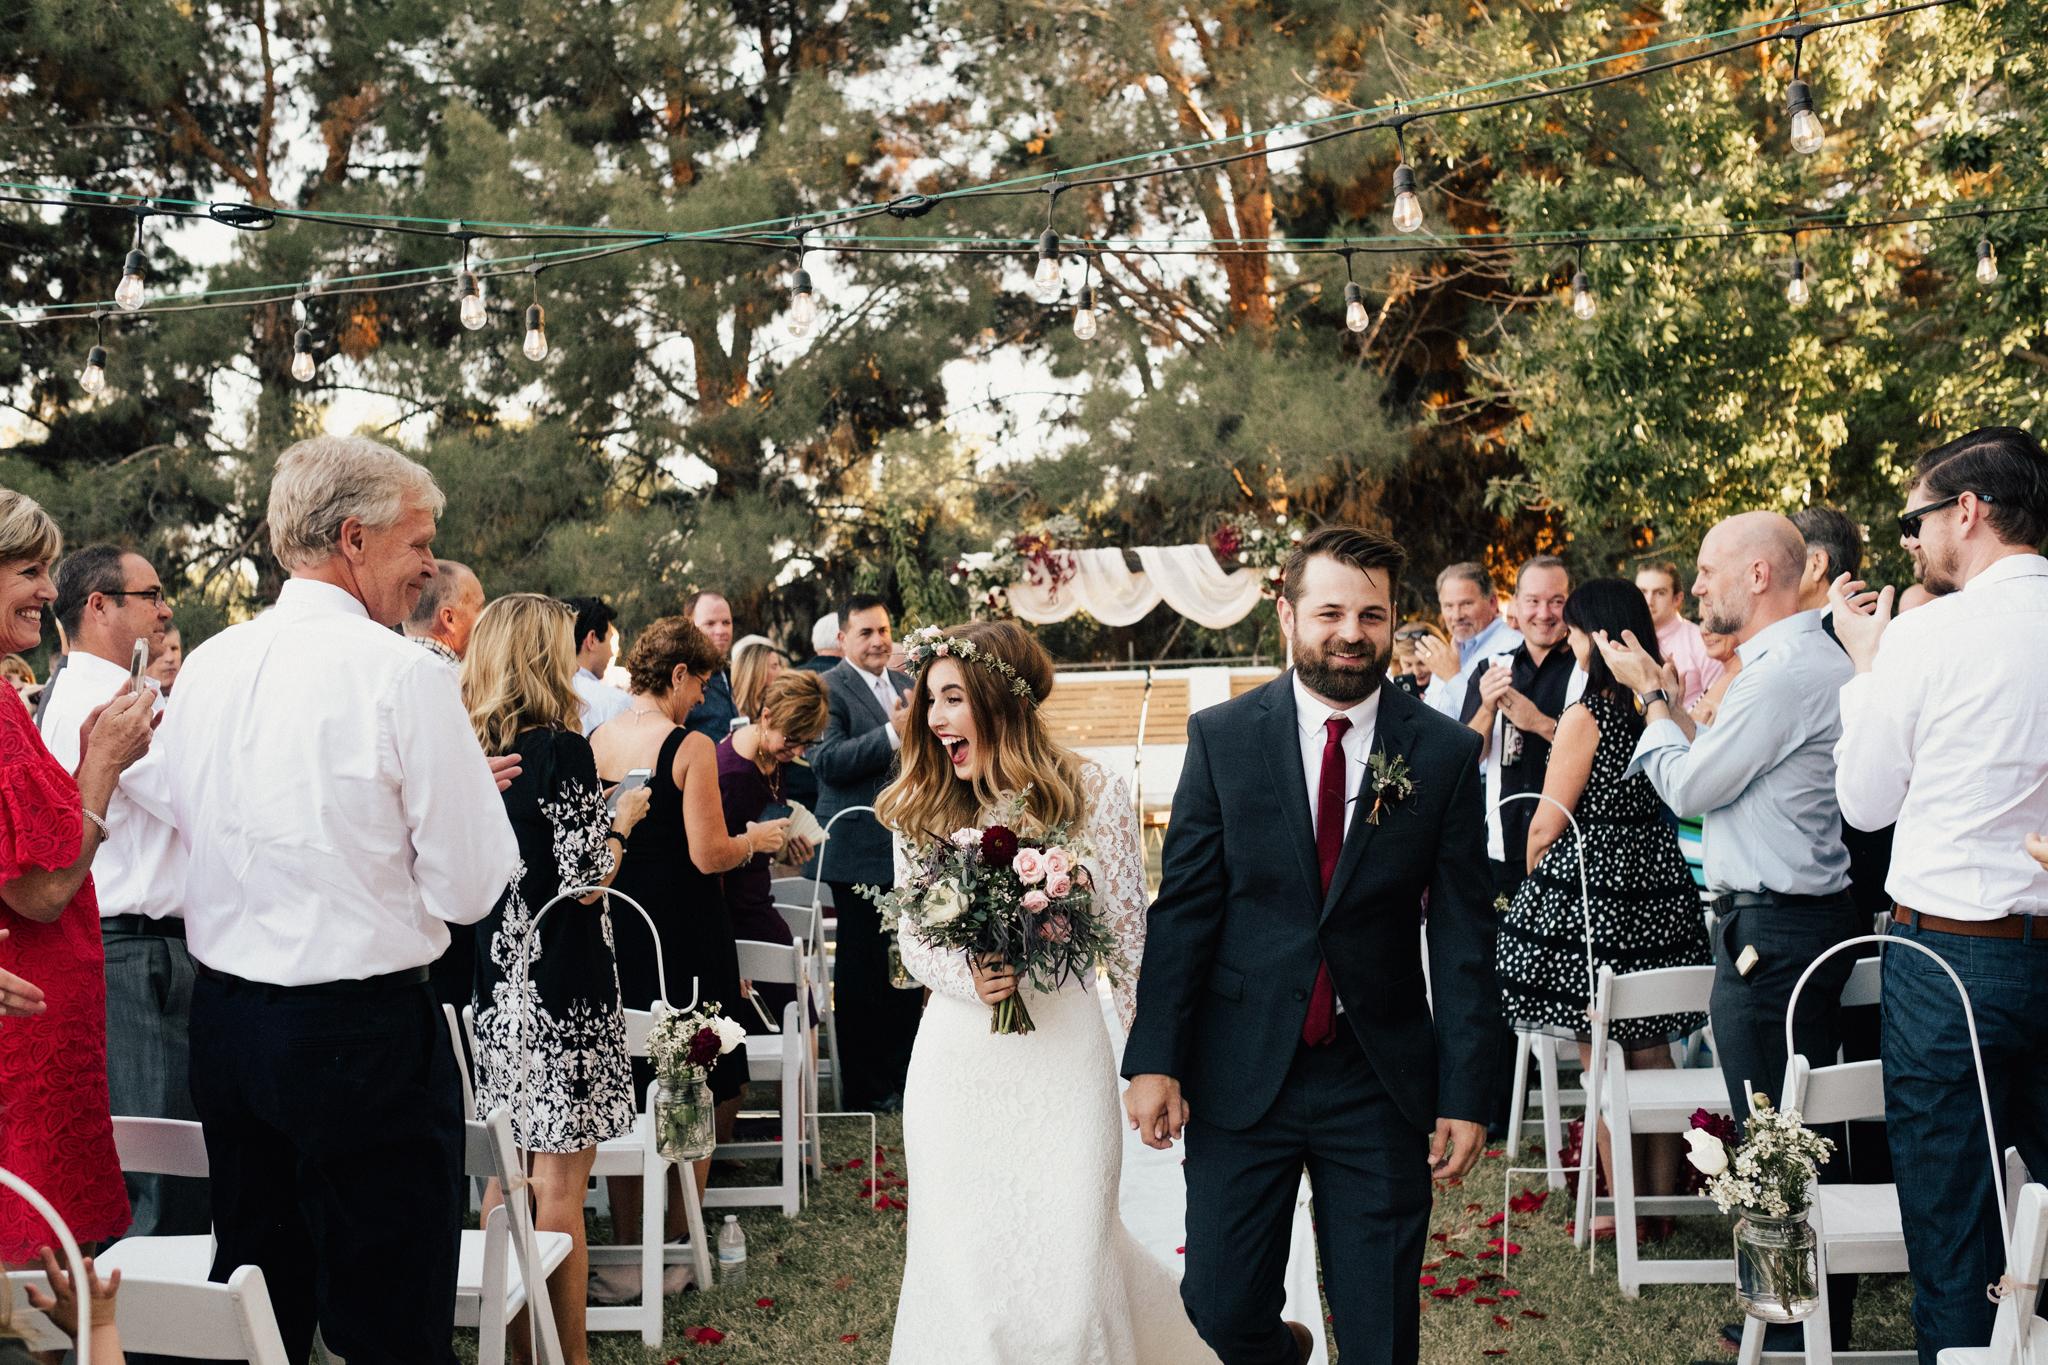 Arizona-Adventure-Elopement-Wedding-Photographer-79.jpg